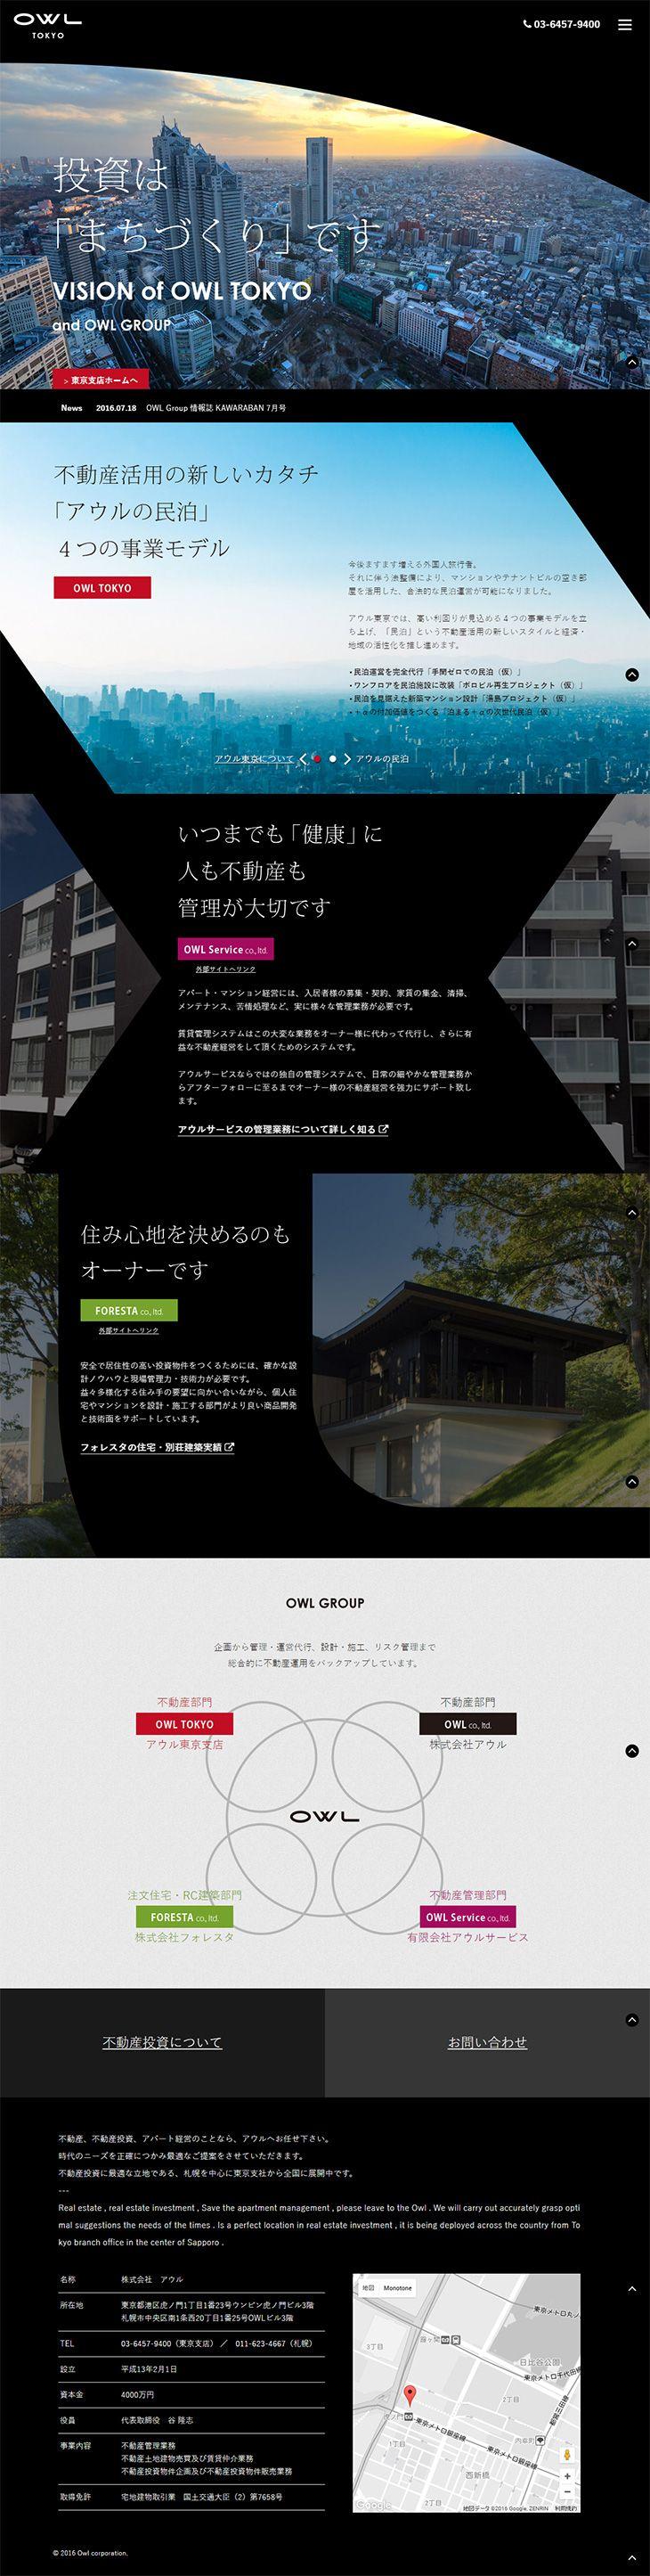 screencapture-owl-fudosan-tokyo-1471857378933.jpg (730×2891)